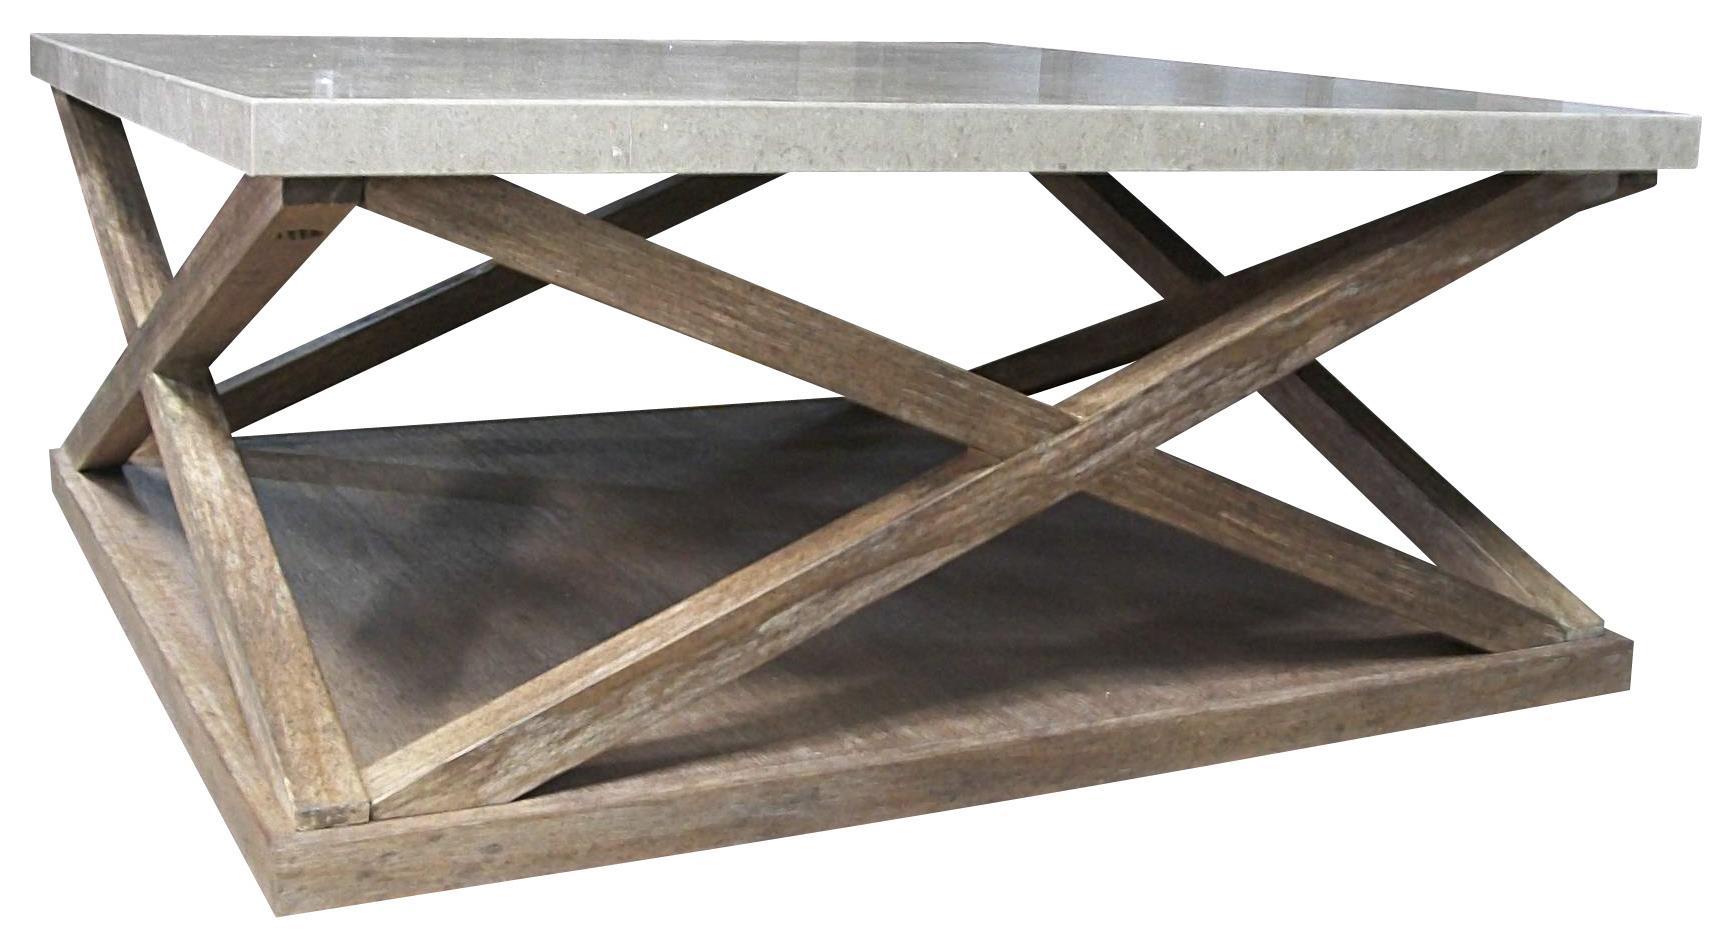 Belfort Signature Madera Square Cocktail Table - Item Number: 192301-2303